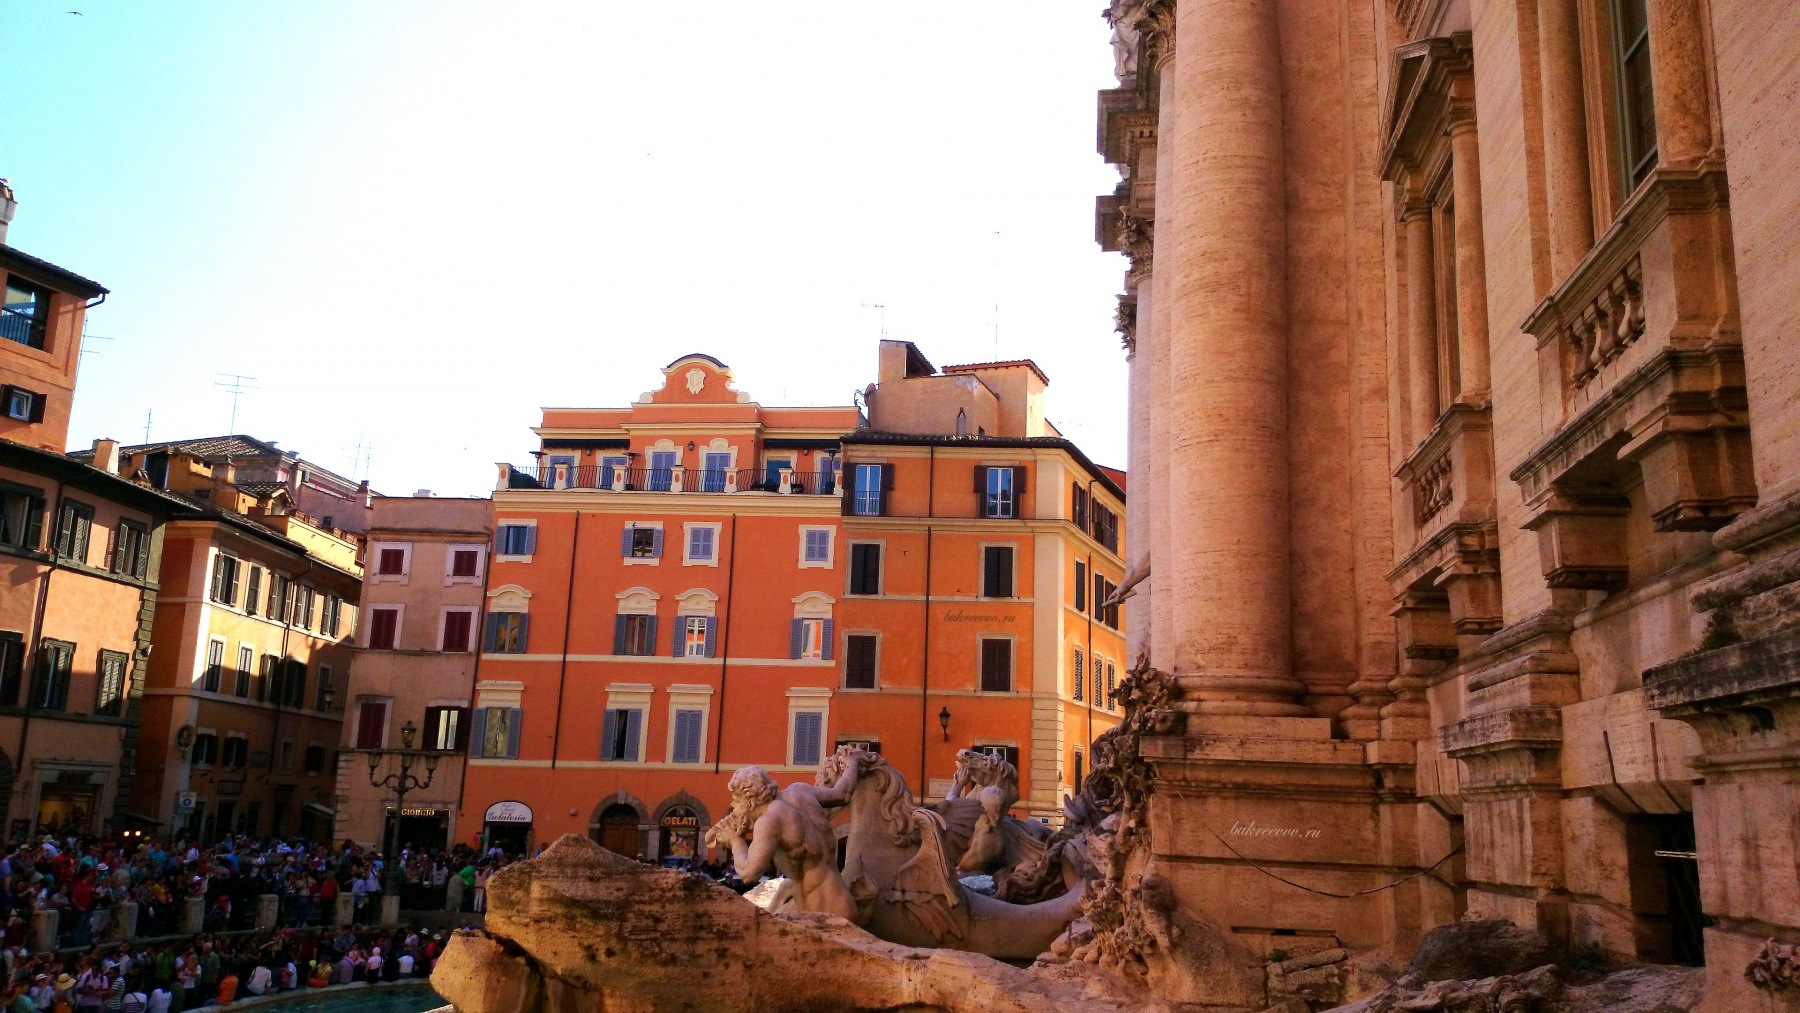 Fontana di Trevi 63